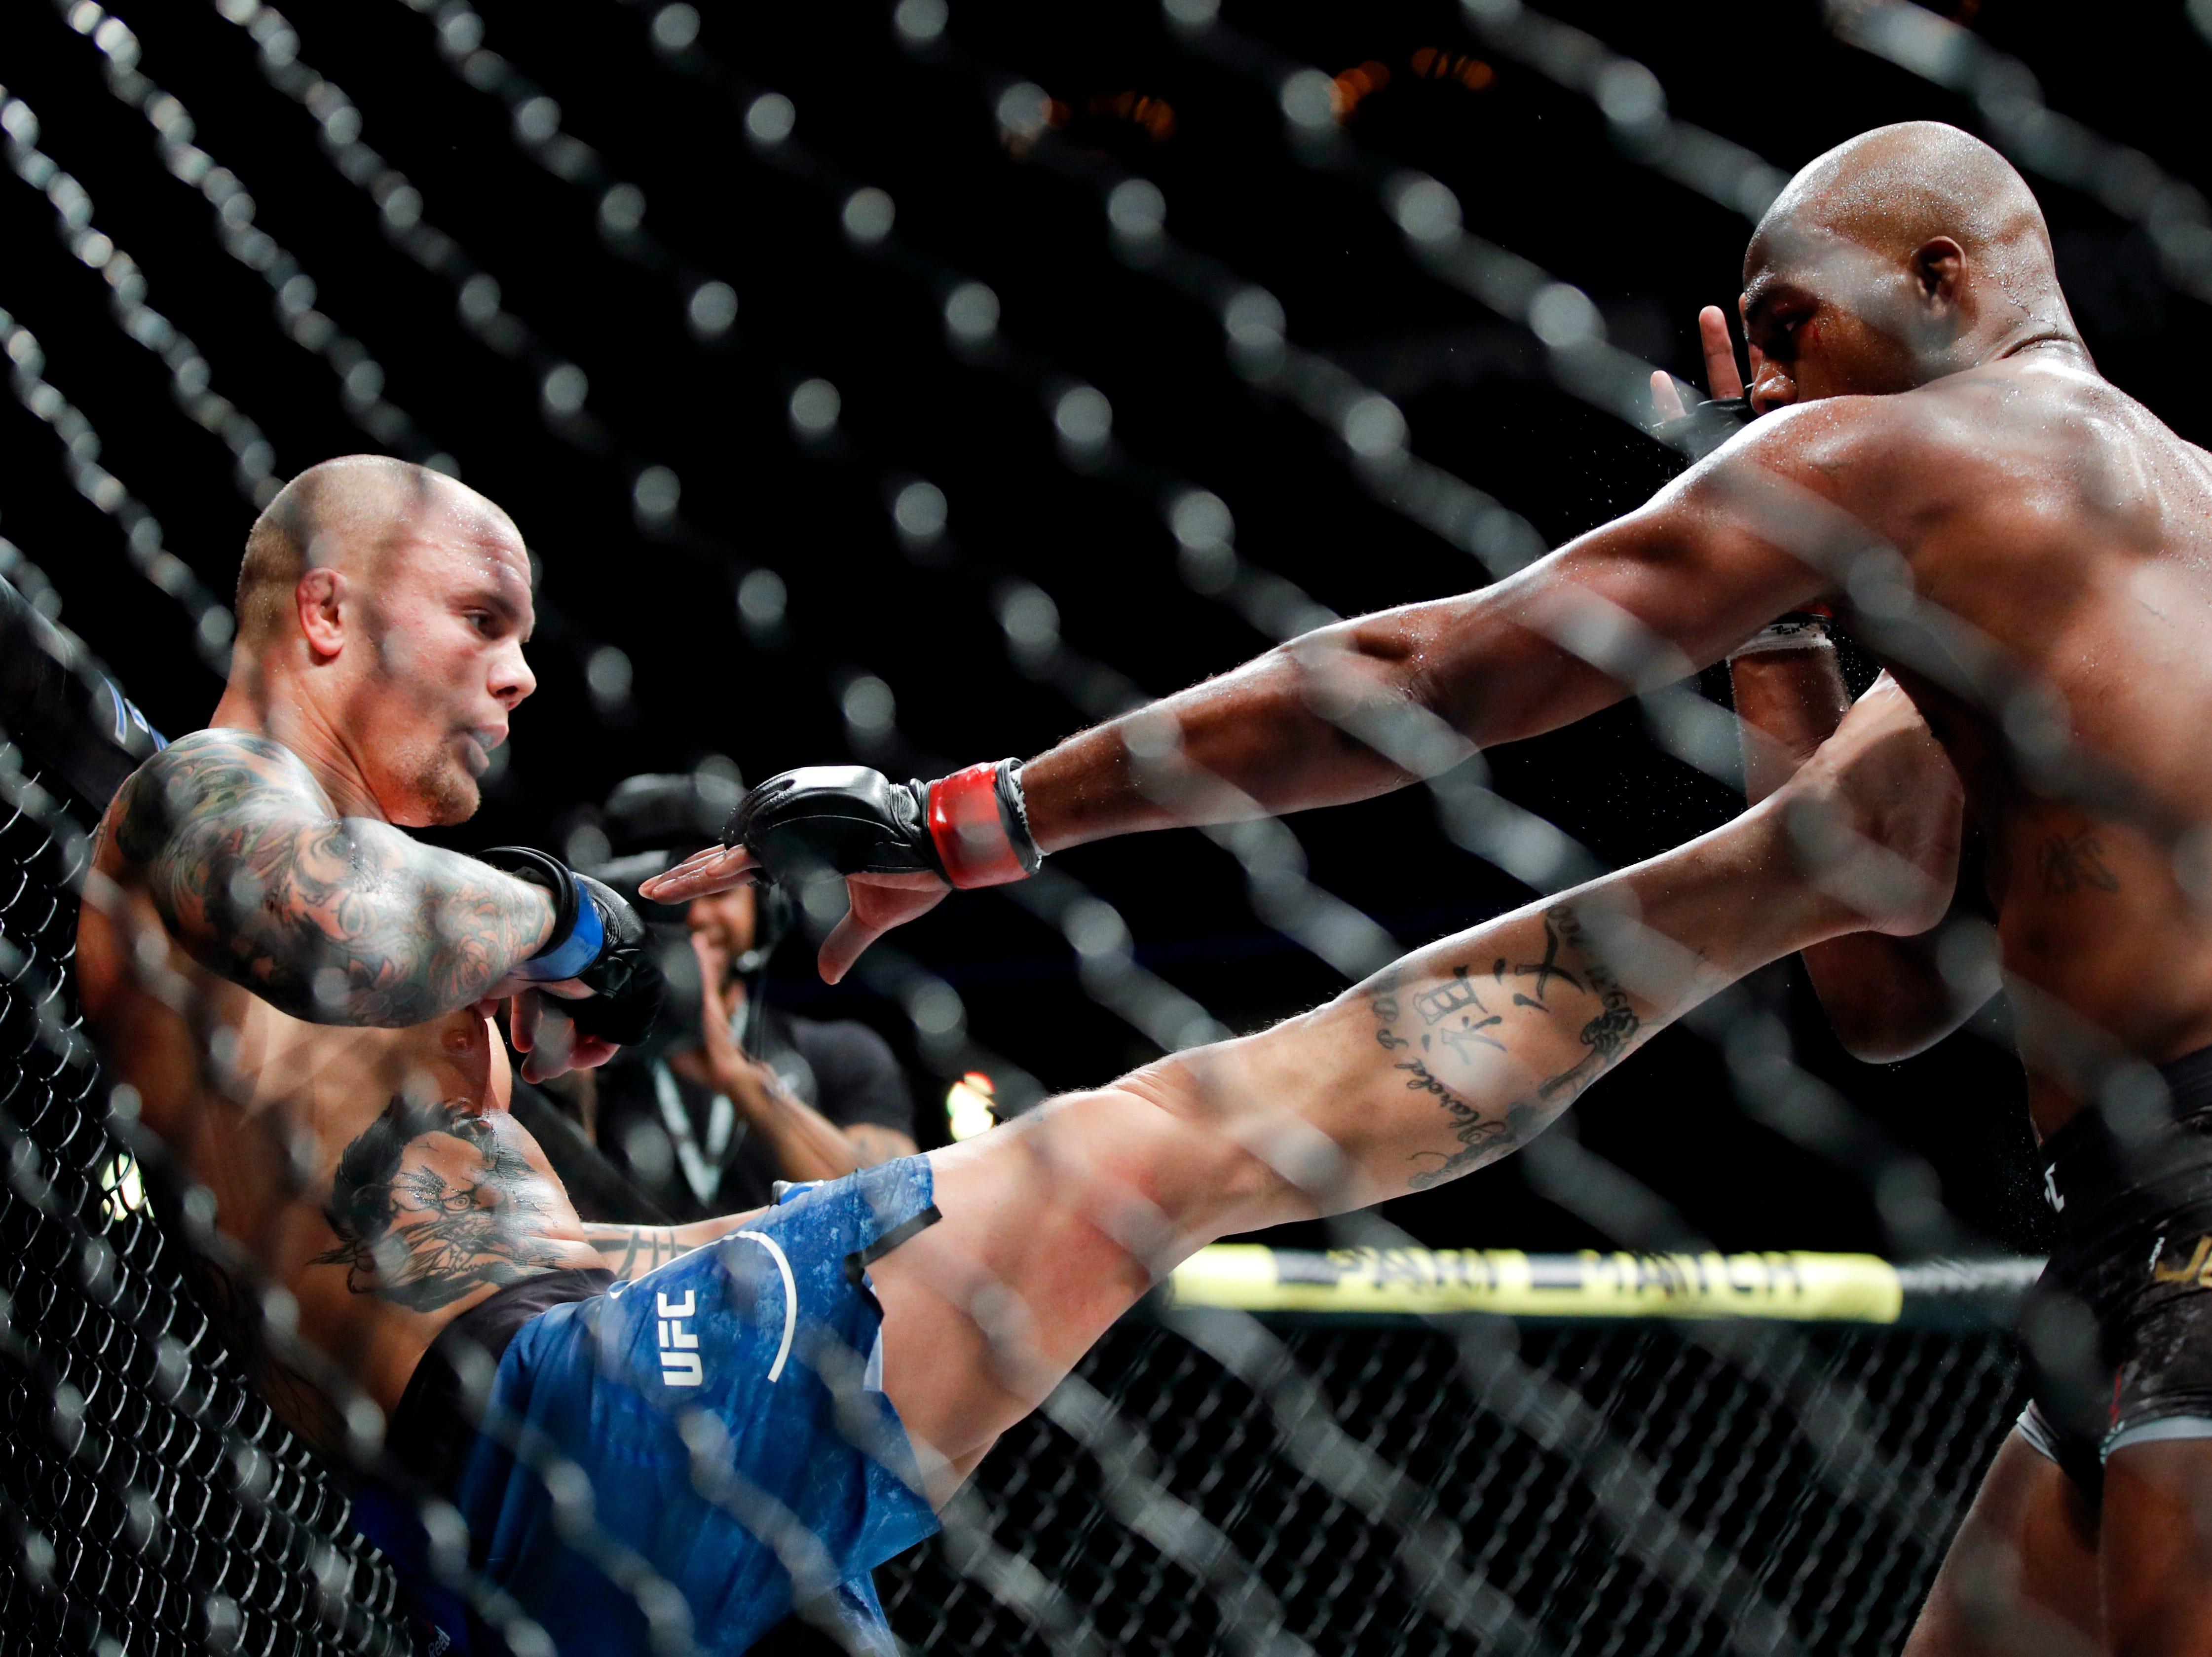 Anthony Smith, left, kicks Jon Jones in a light heavyweight mixed martial arts title bout at UFC 235, Saturday, March 2, 2019, in Las Vegas. (AP Photo/John Locher)